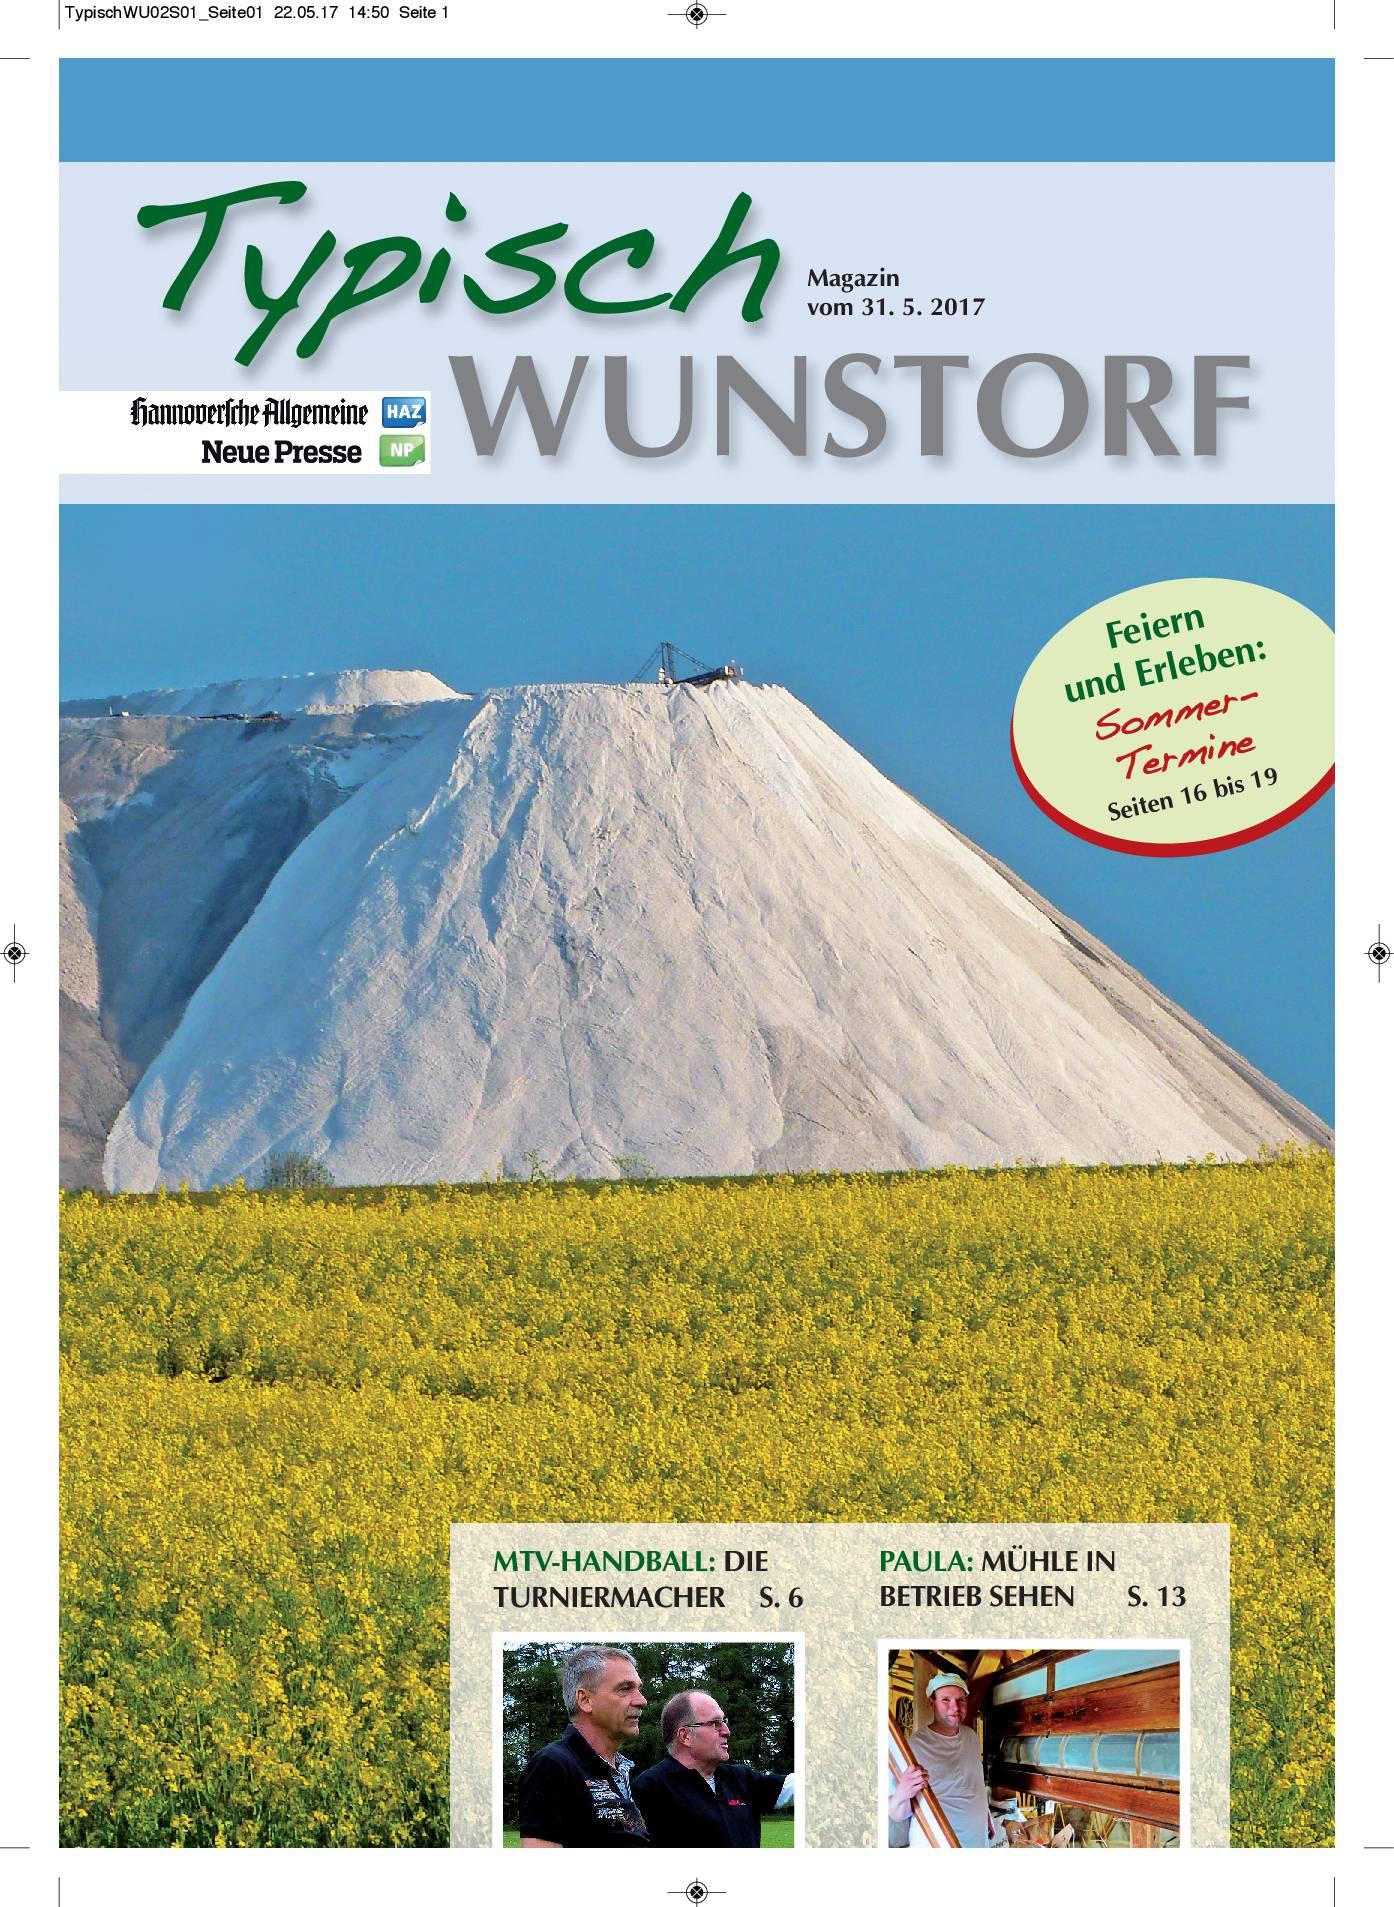 wunstorf-nr-2-vom-31-05-2017